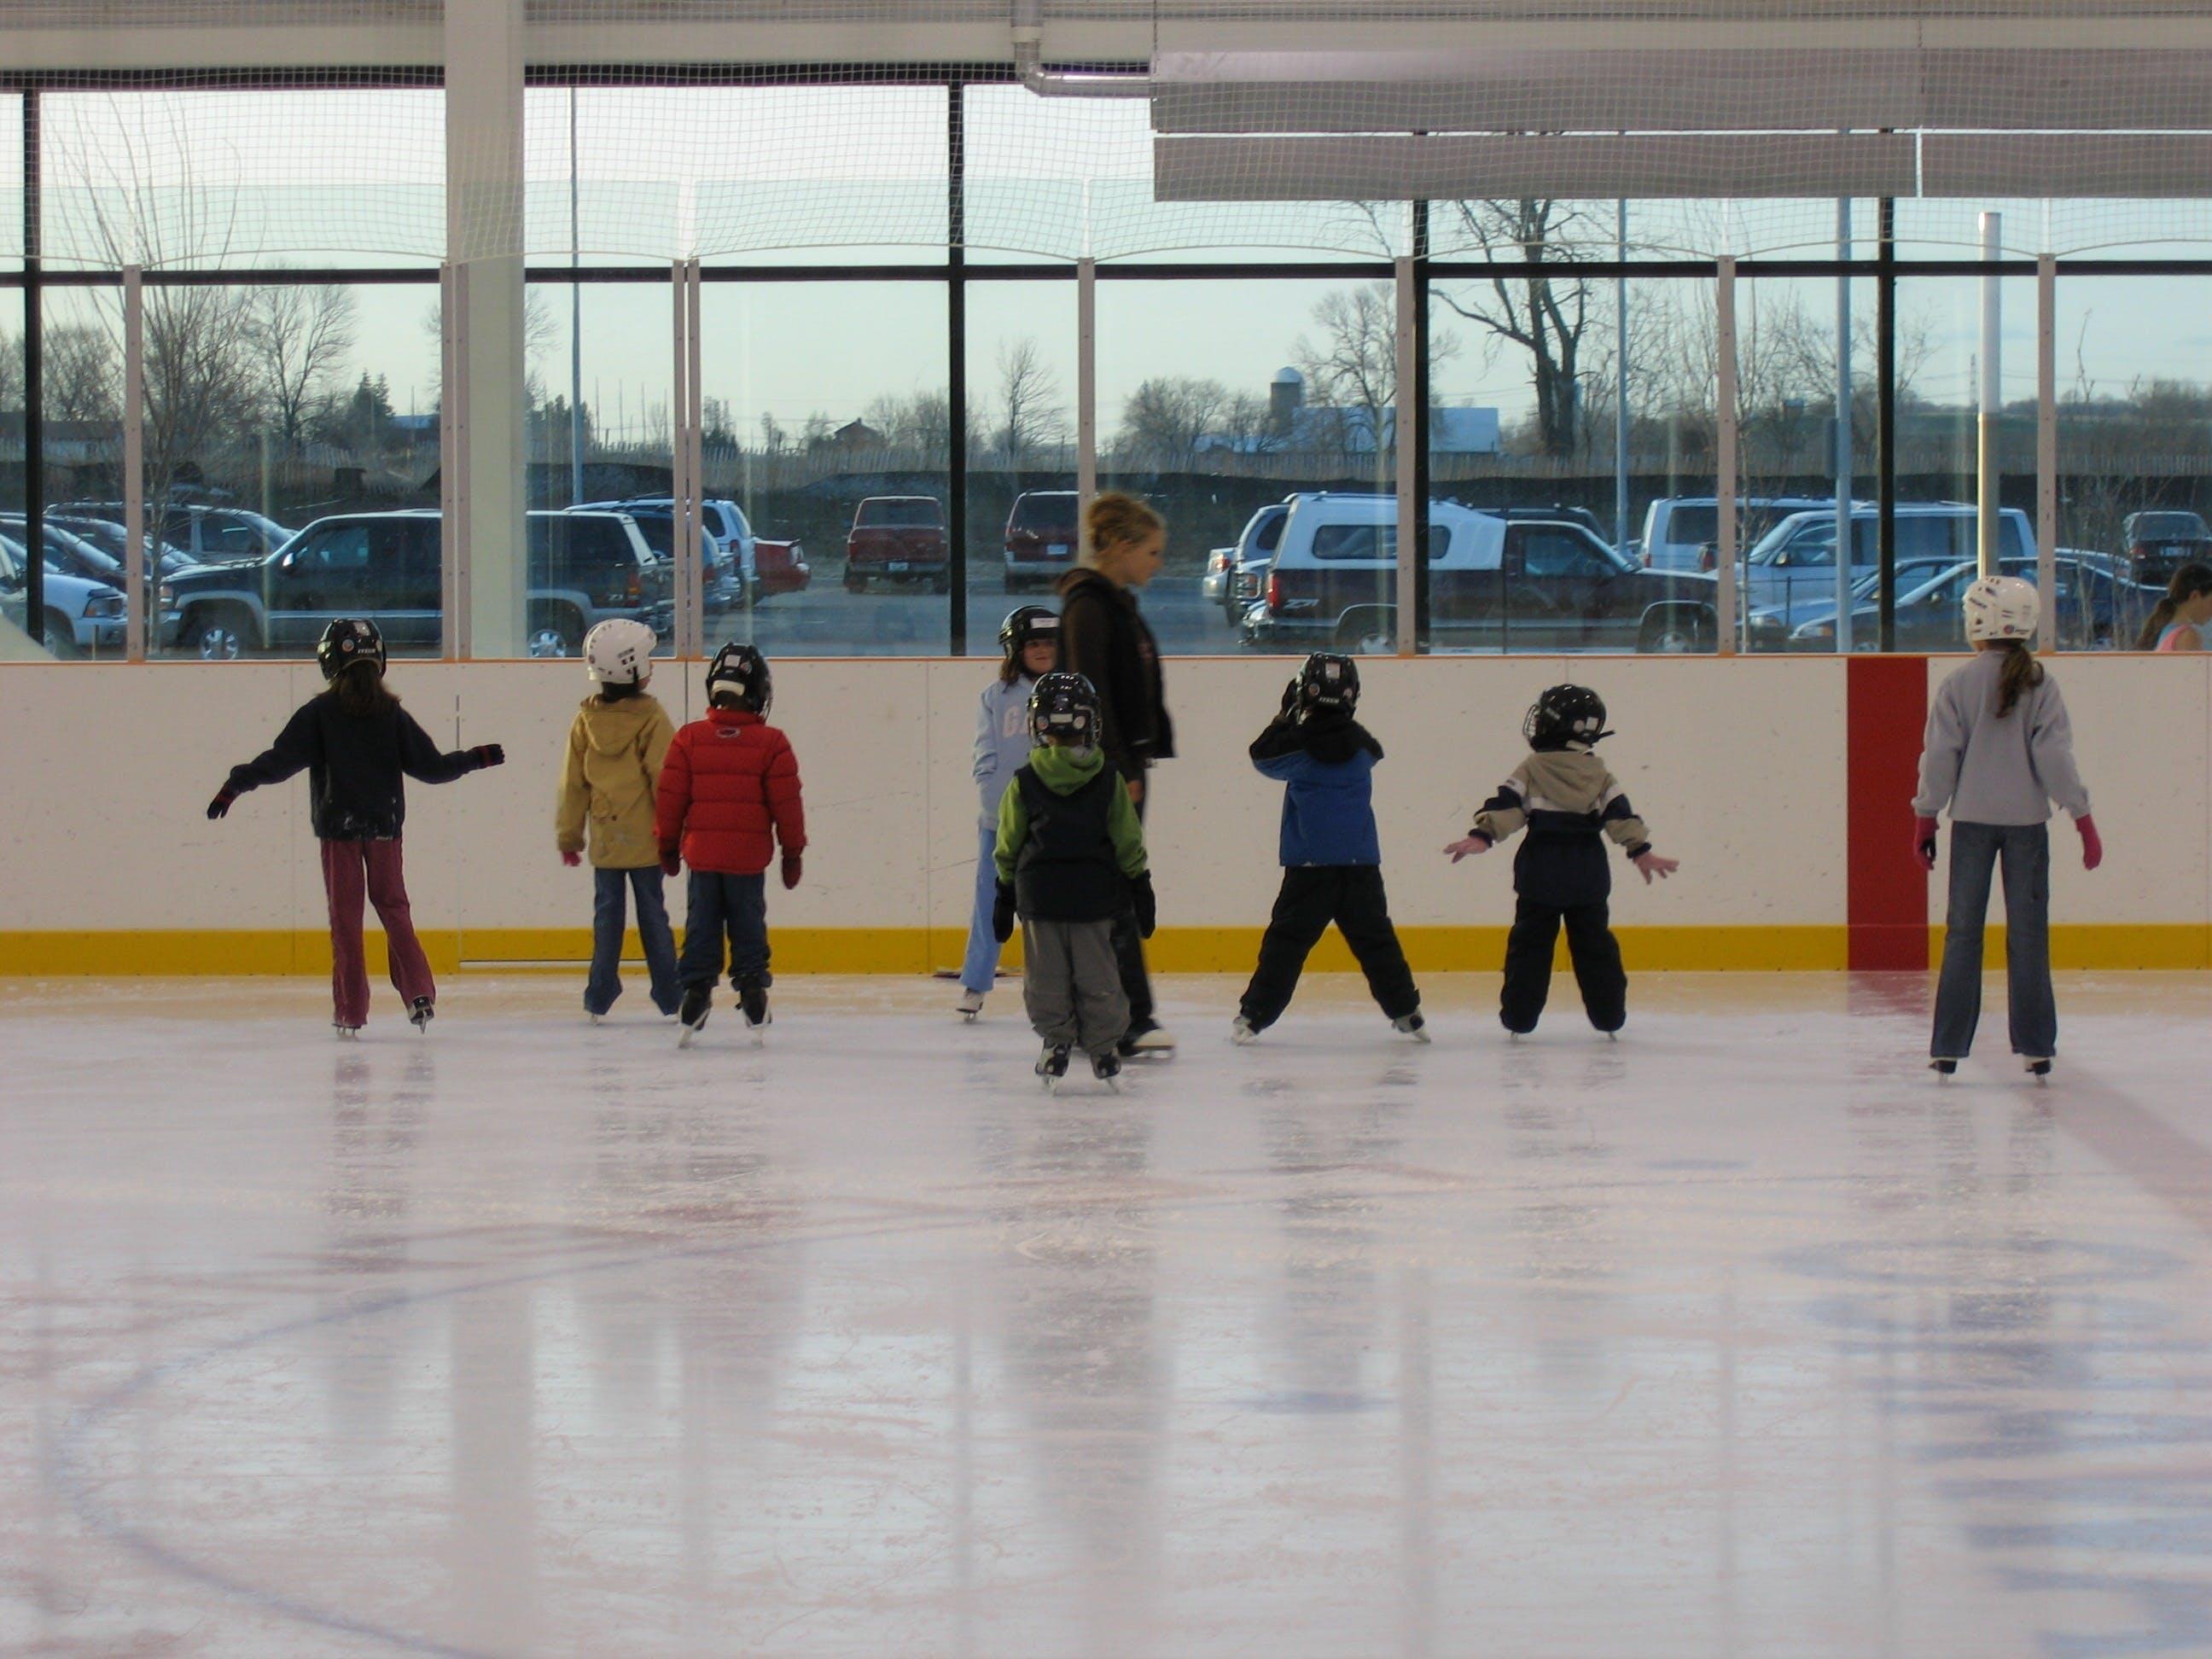 Oshawa children and youth learning to skate at an Oshawa facility